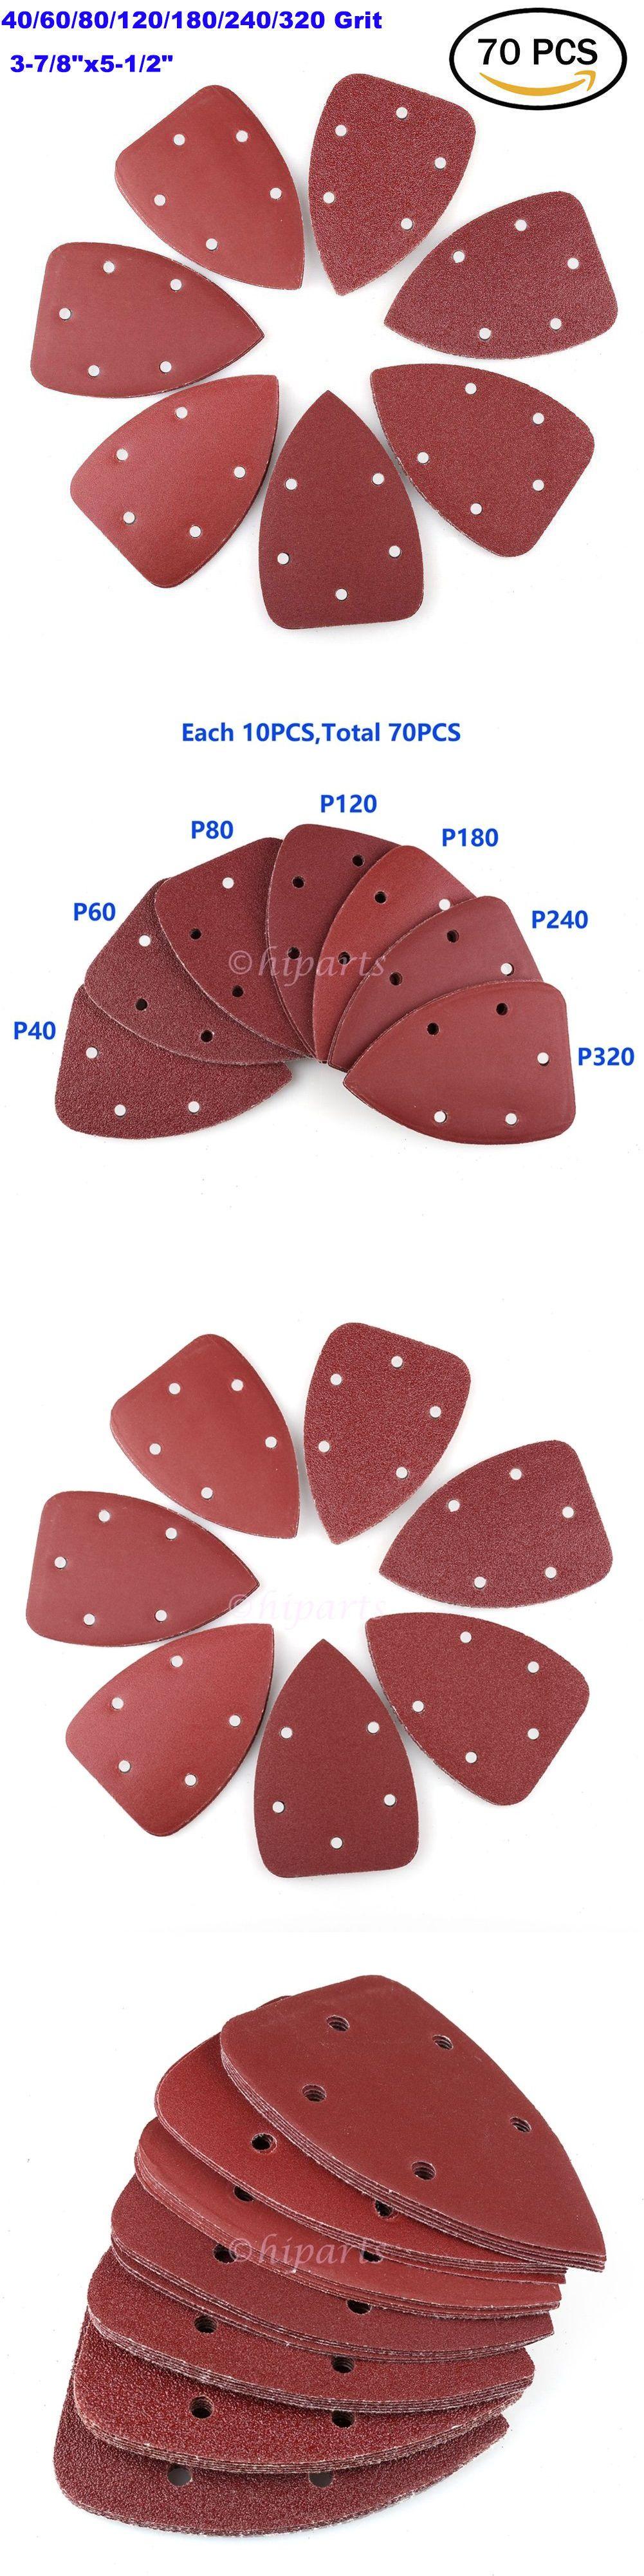 Sander Parts And Accessories 20796 Mouse Detail Sander Paper Sandpaper Sanding Discs Assorted 40 60 80 120 320 G Parts And Accessories Detail Sander Sandpaper